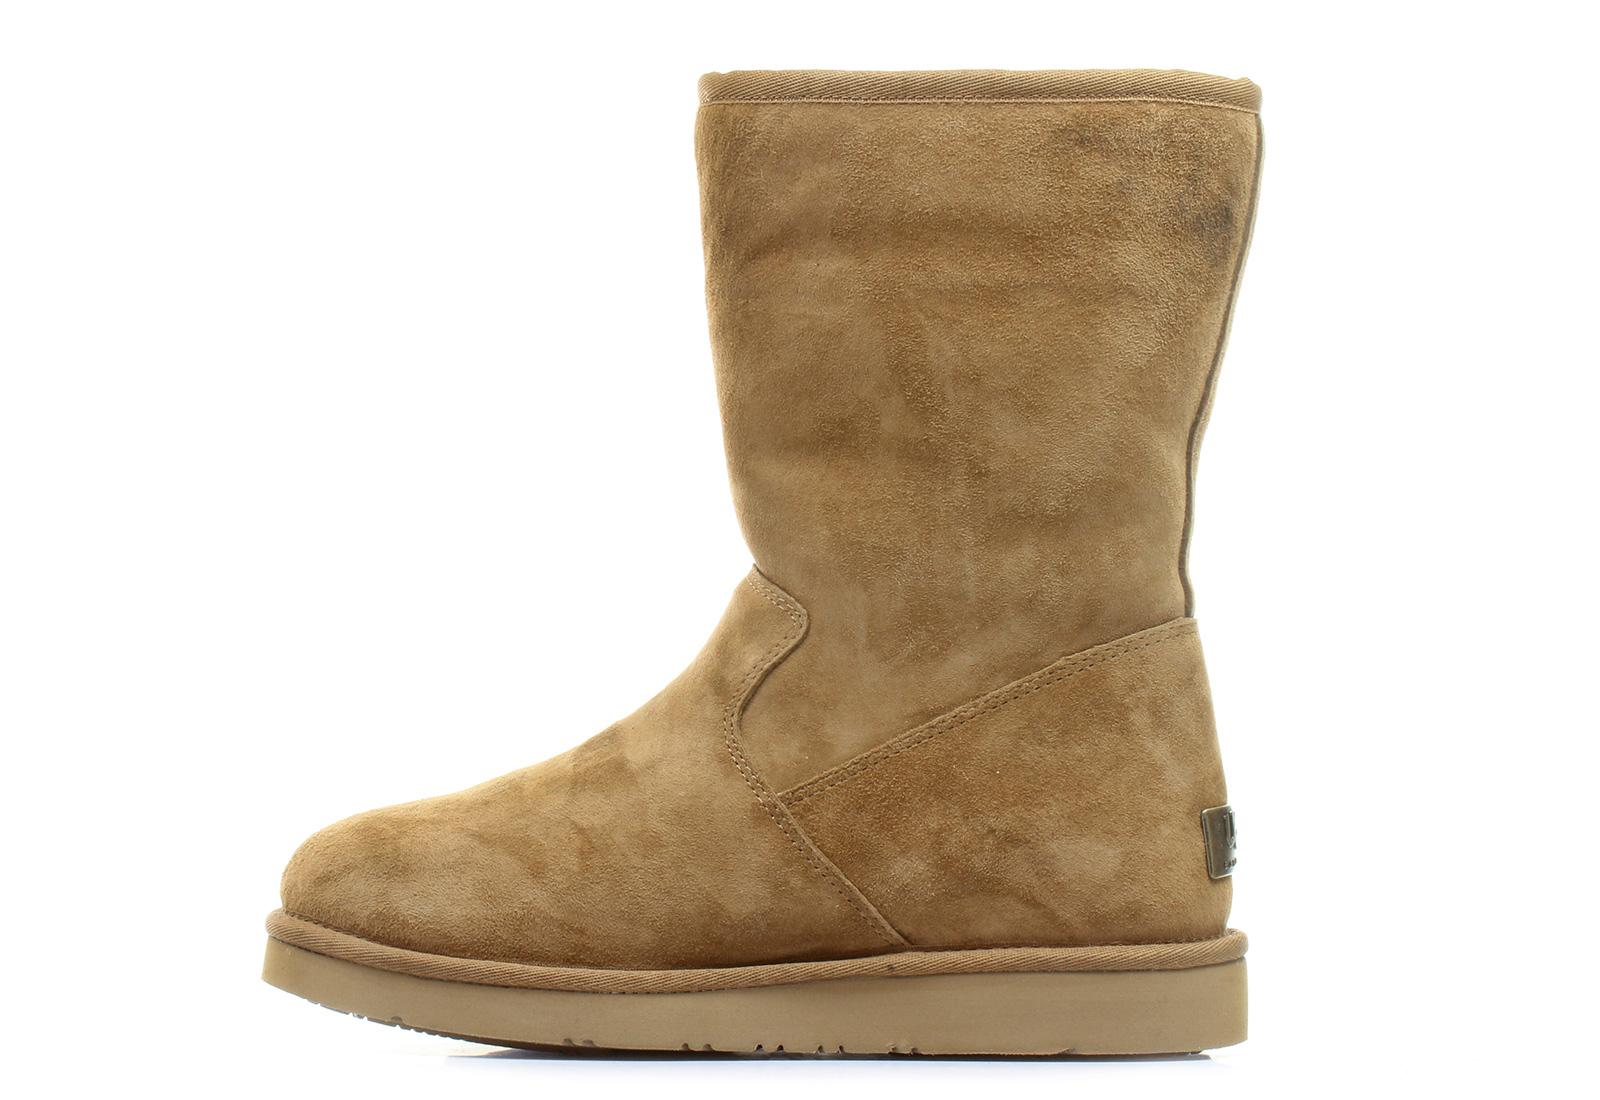 Ugg Boots W Pierce 3